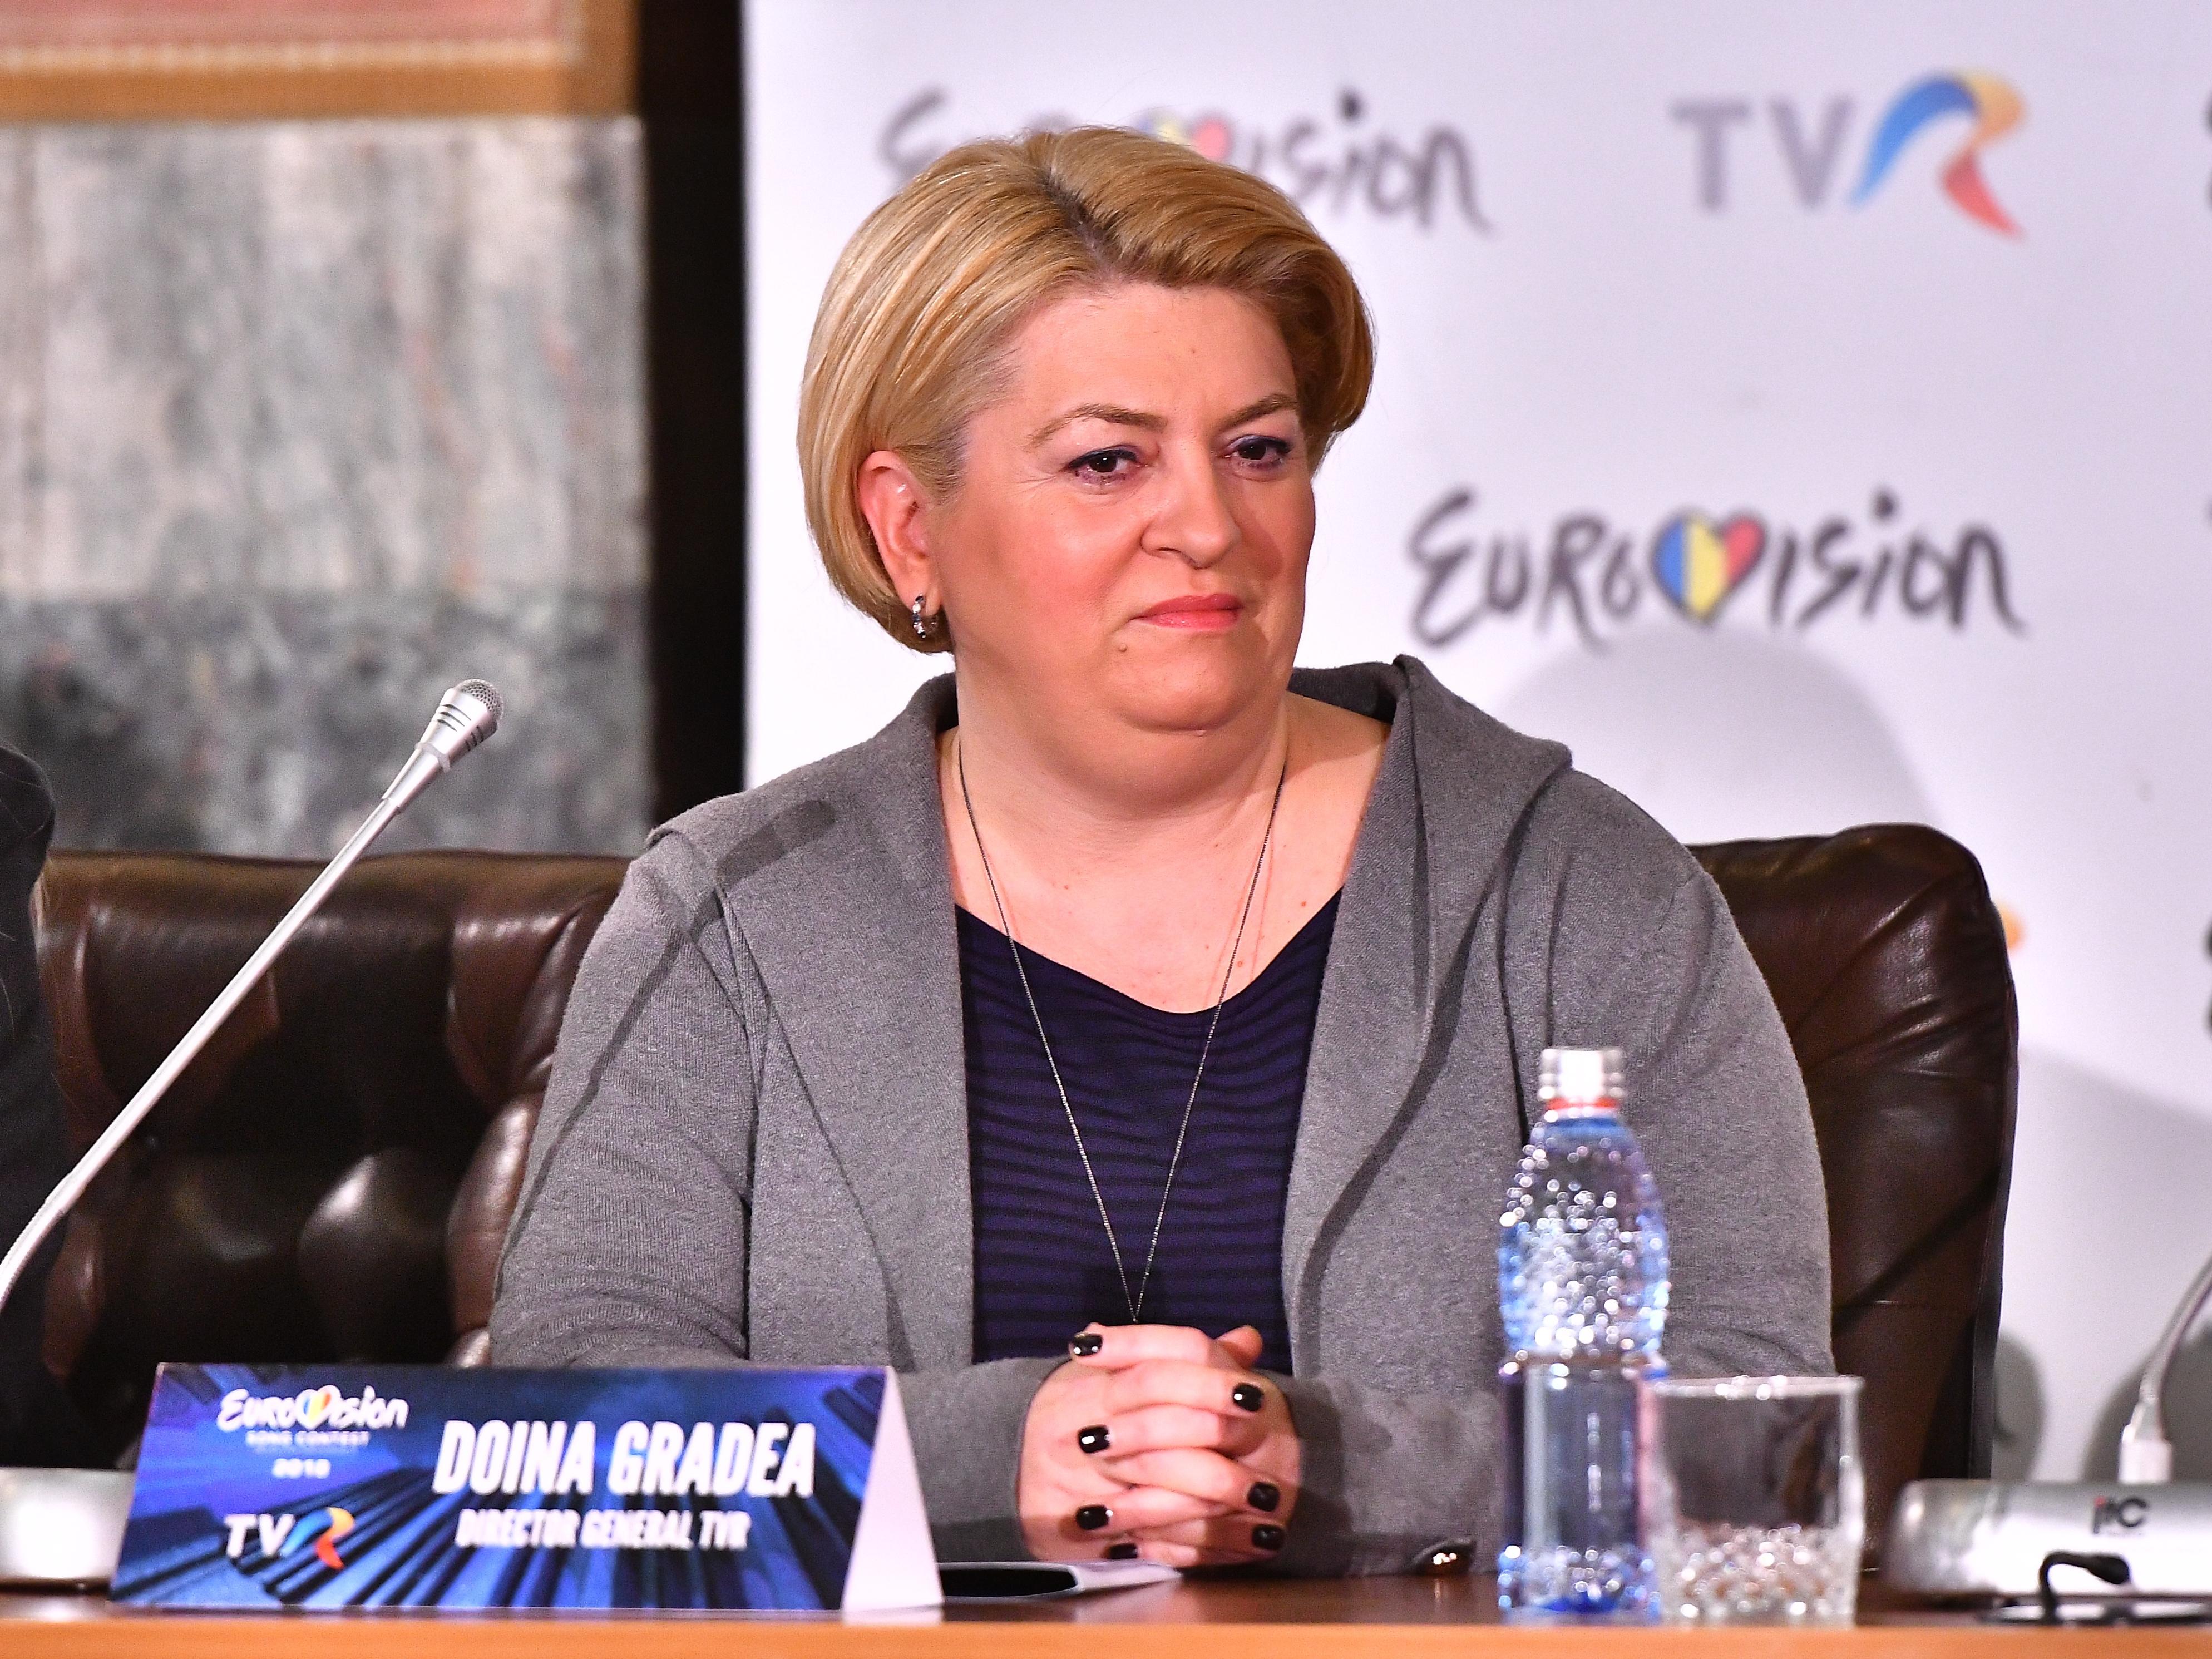 Doina Gradea, general manager of Romania's TVR